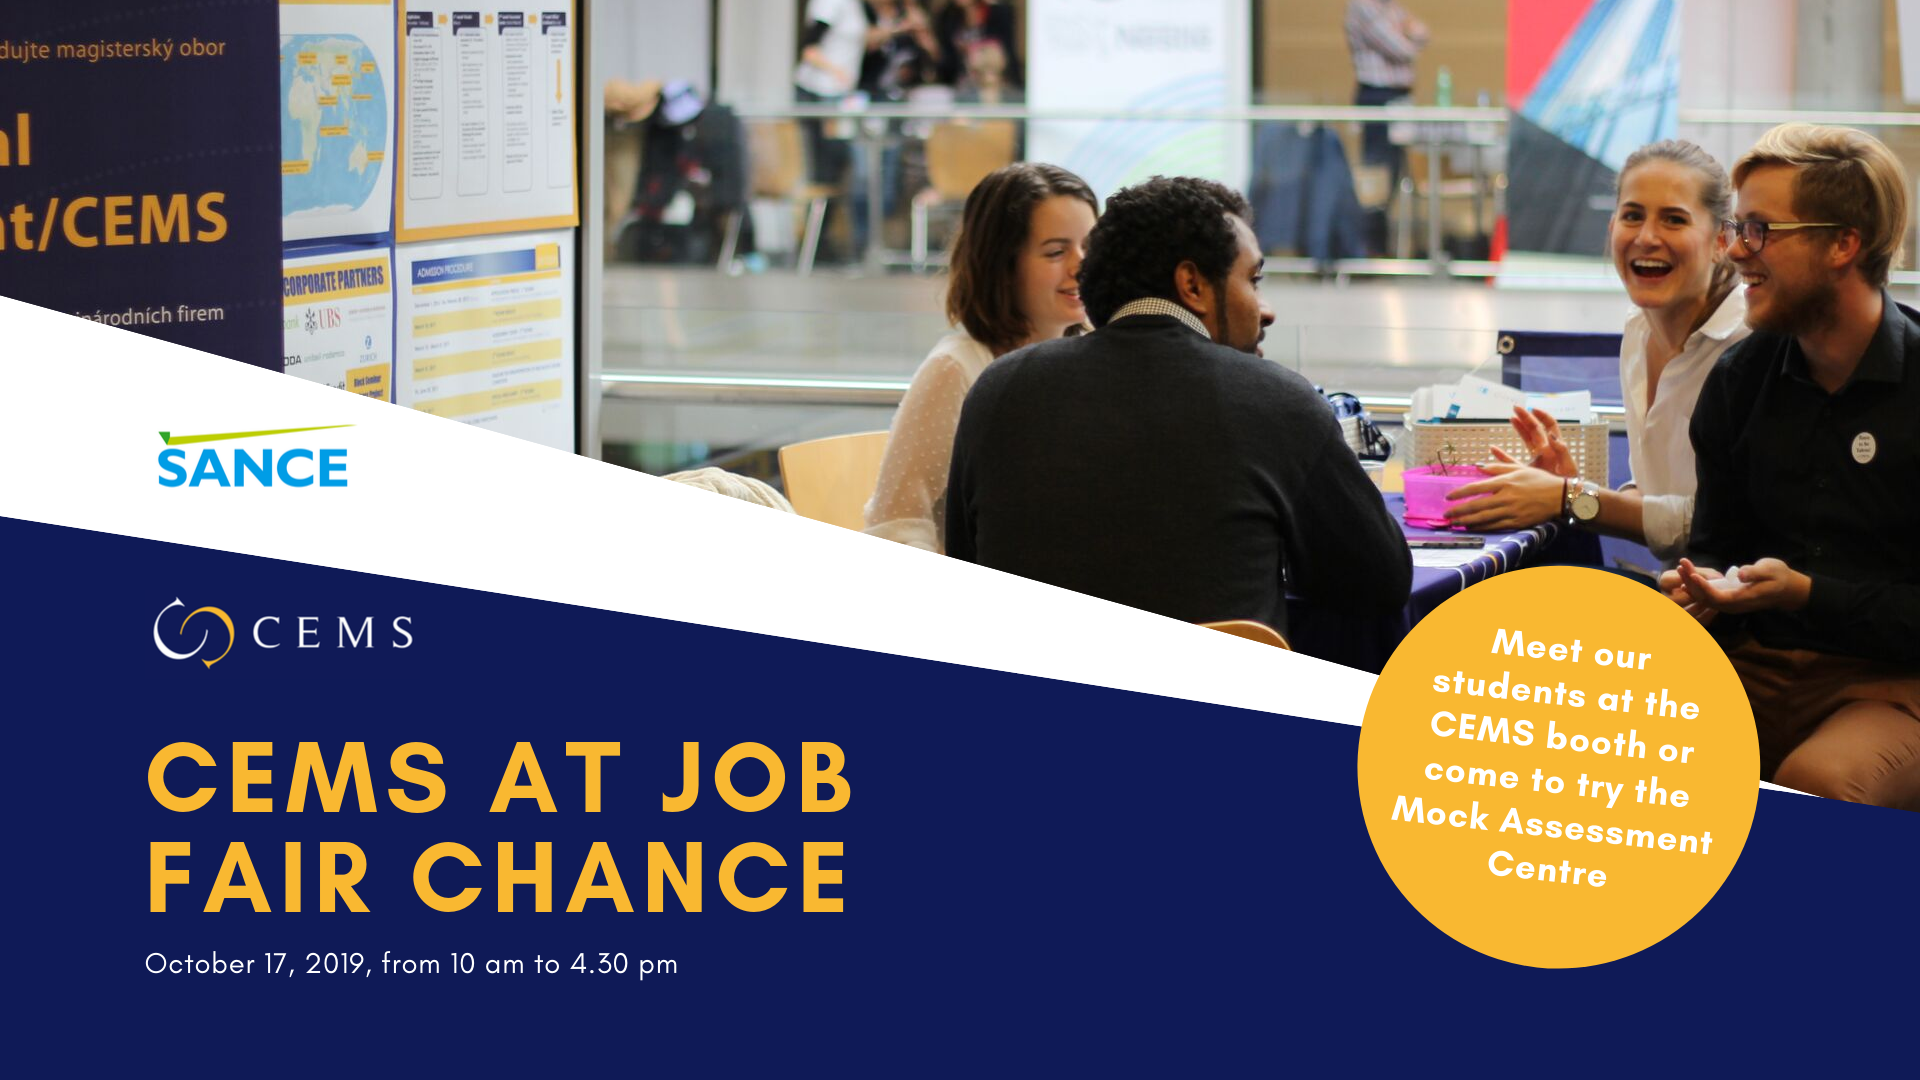 CEMS Mock Assessment Centre at Job Fair Šance – October 17, 2019